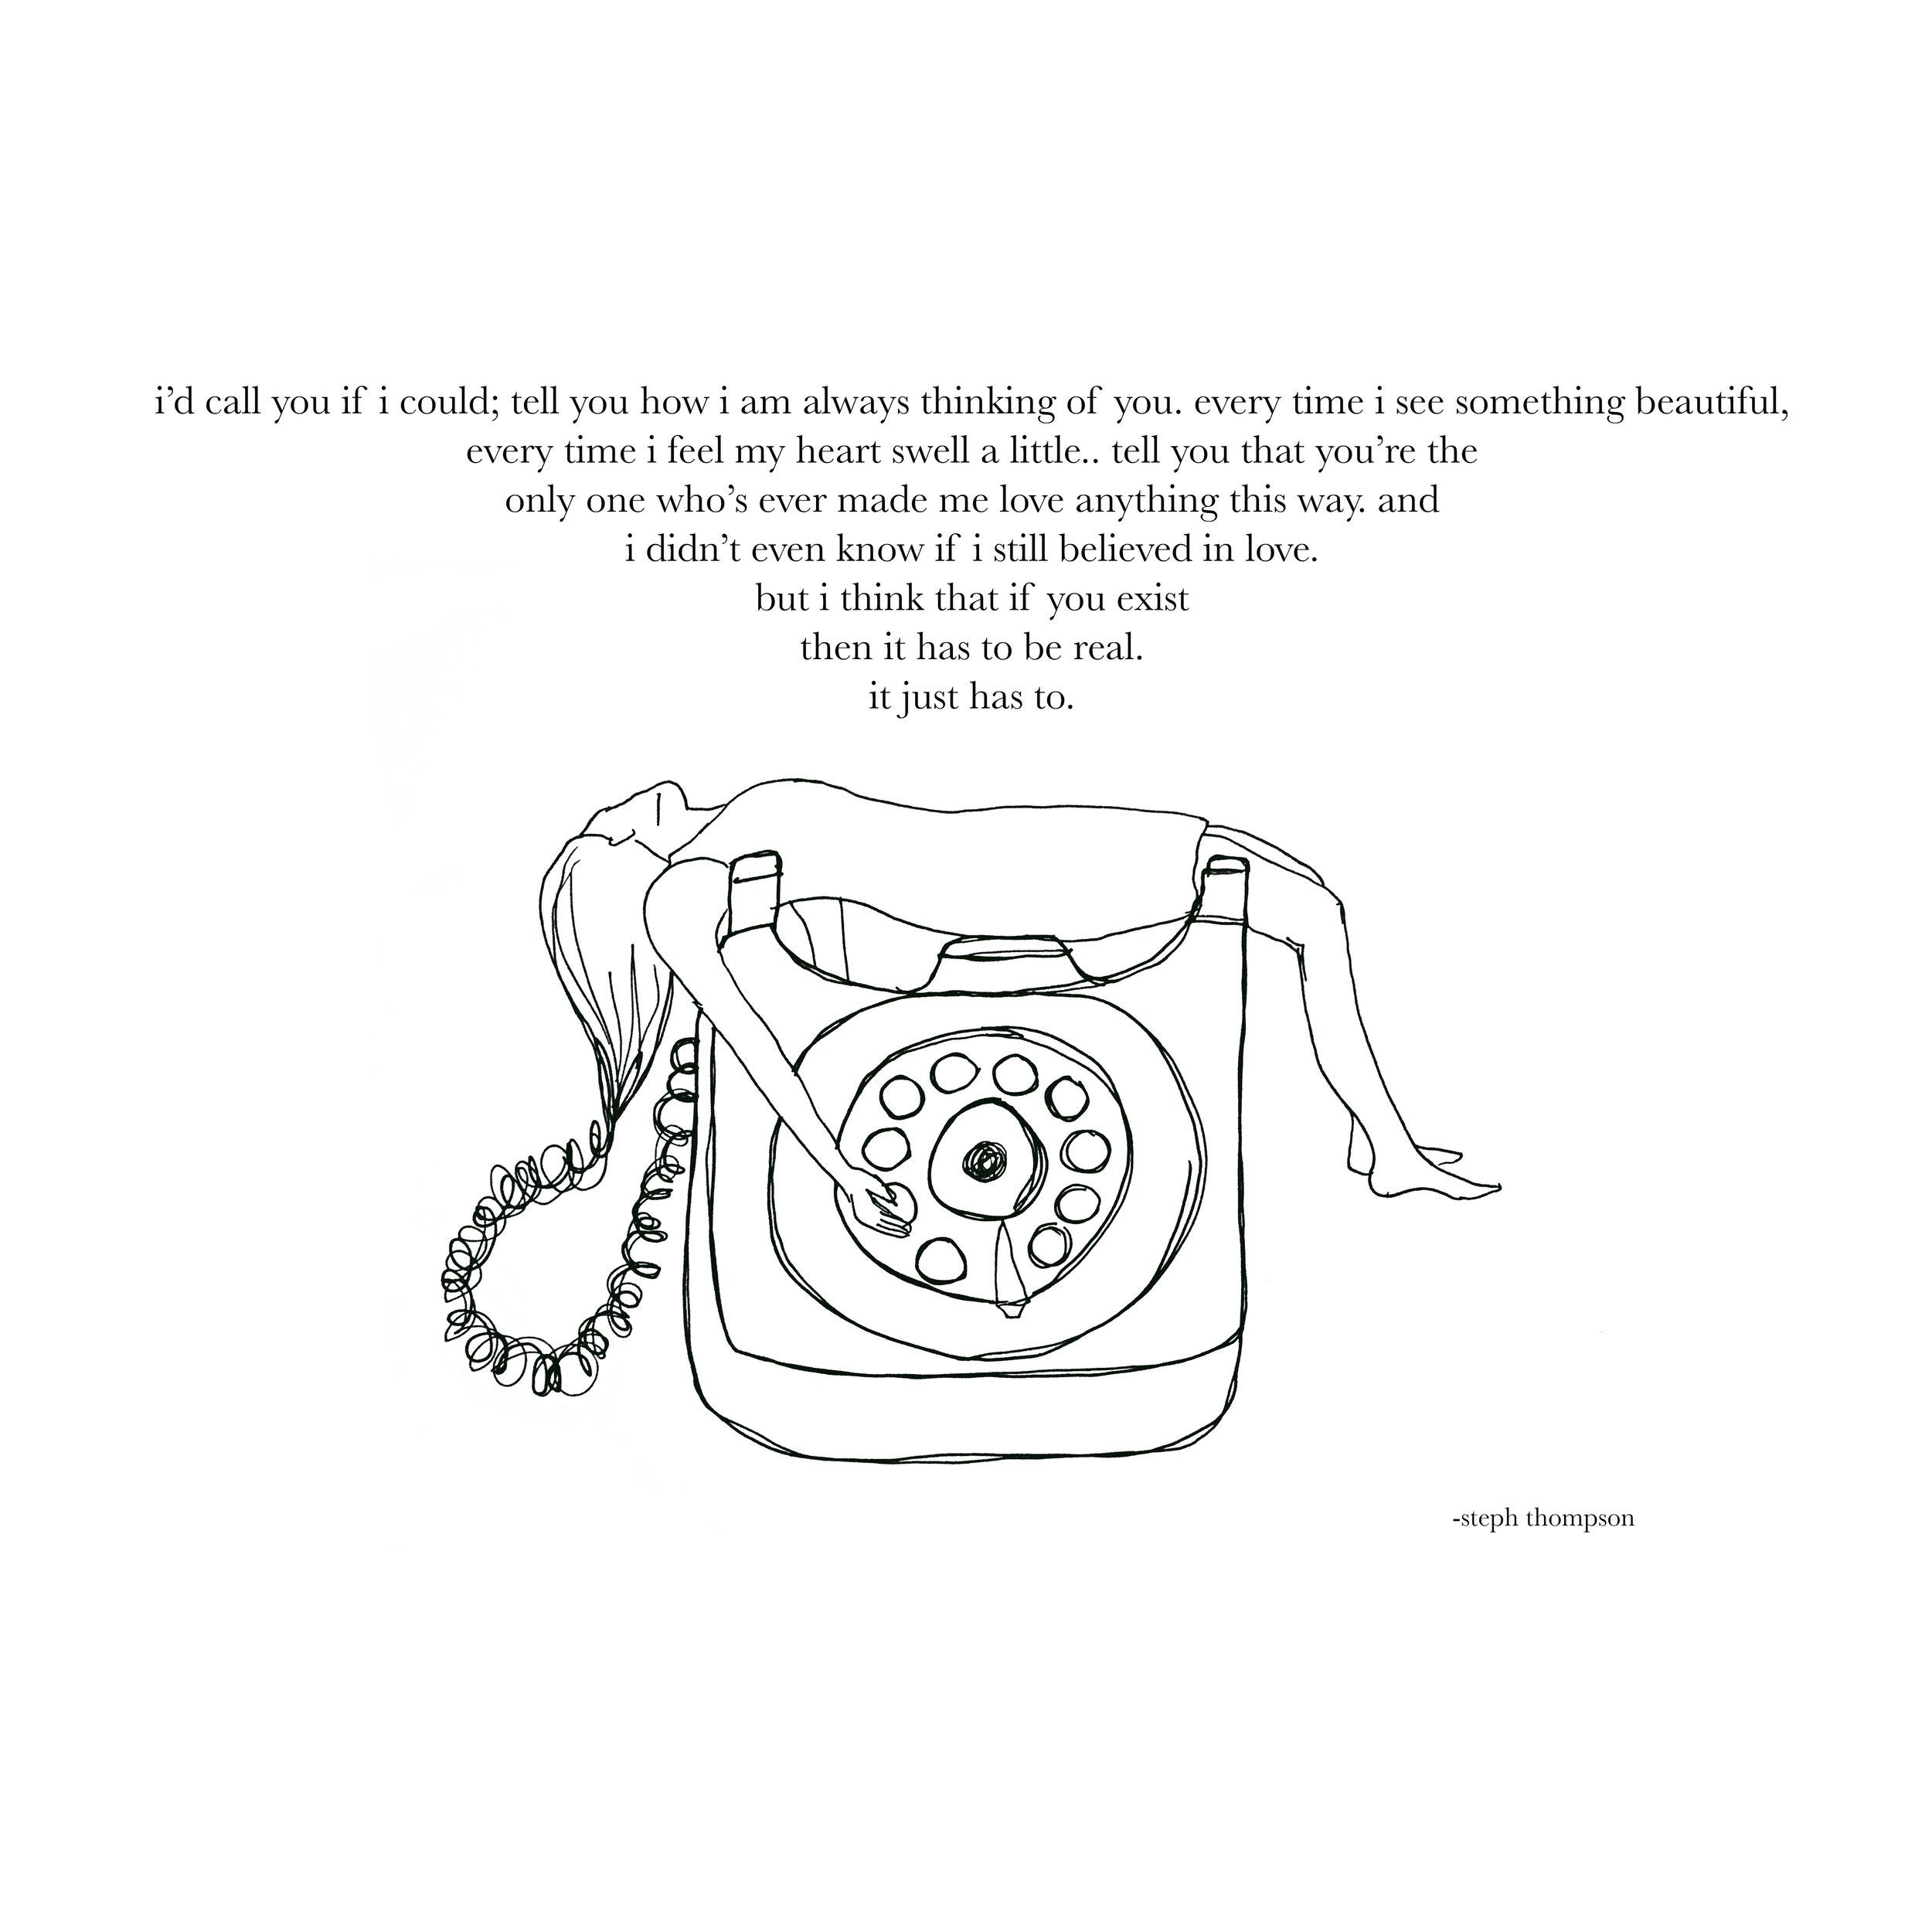 callyou.jpg